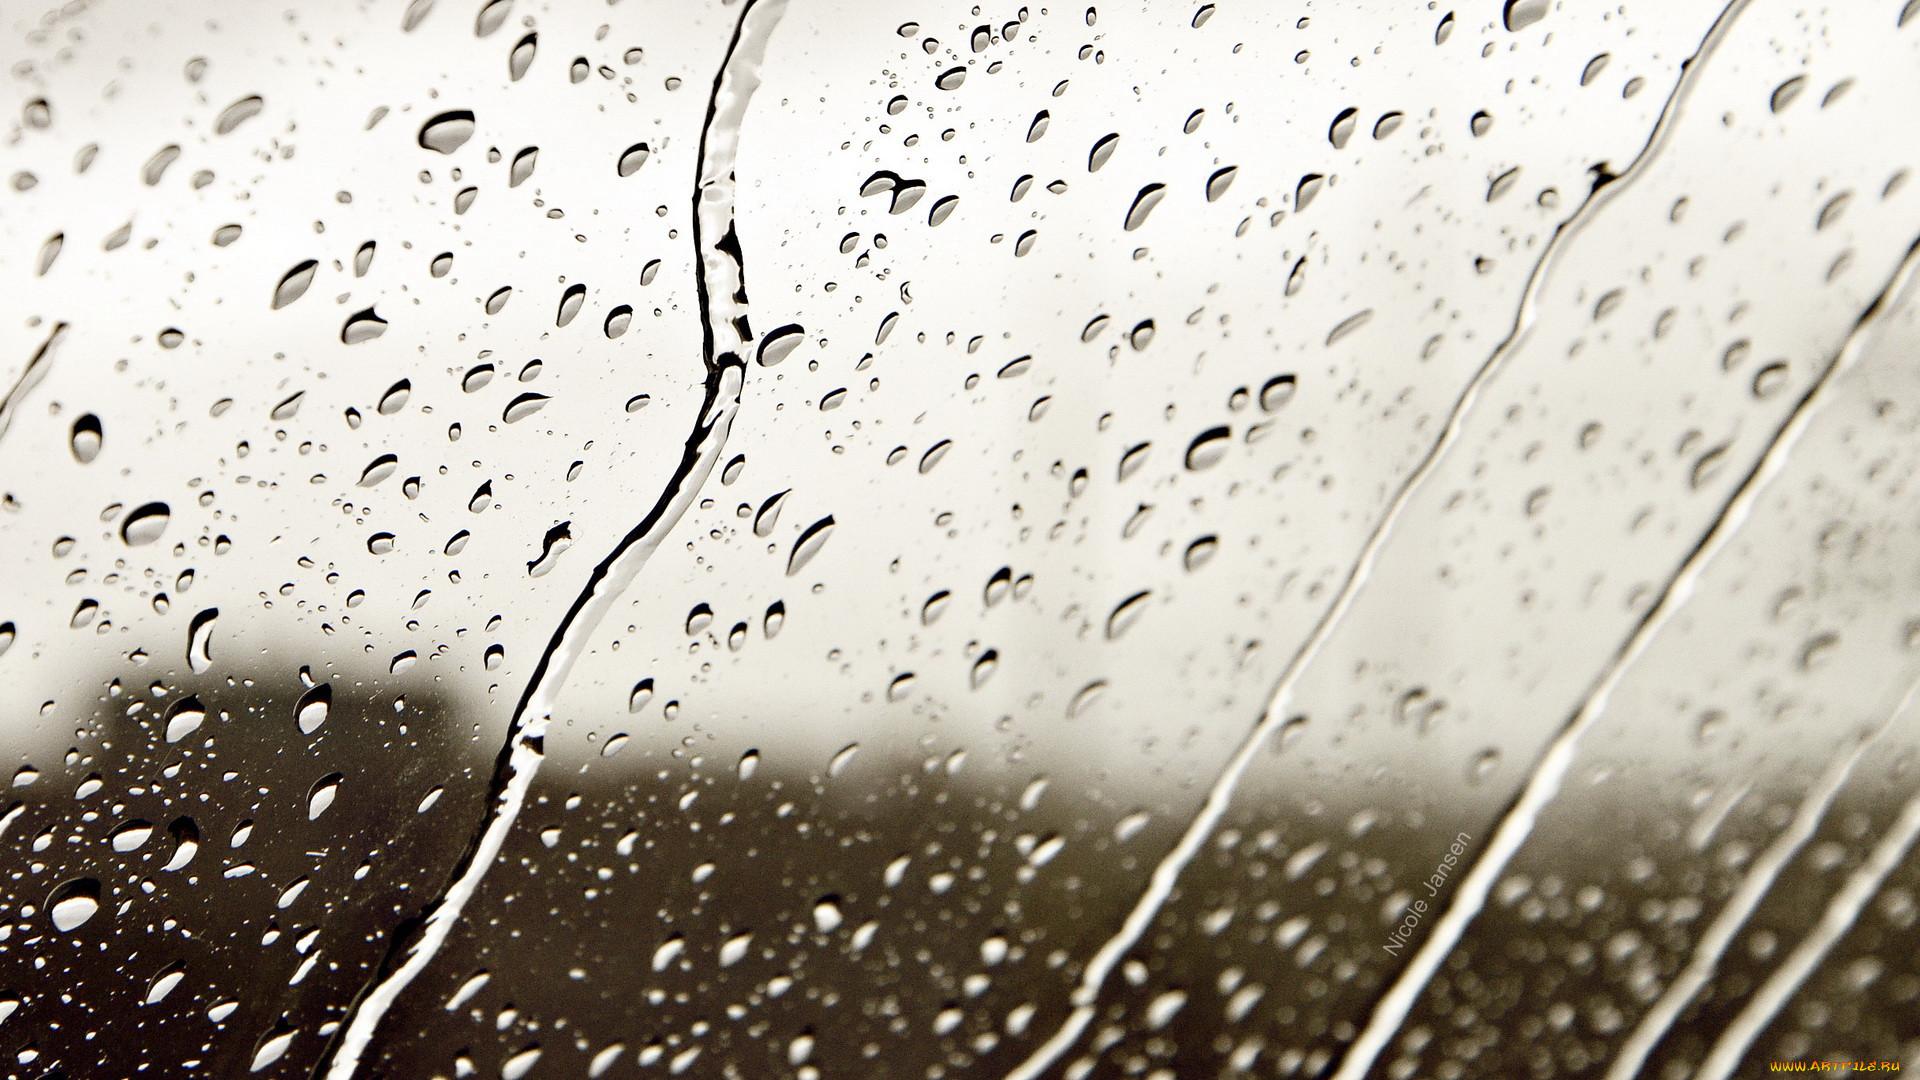 Картинка капли дождя на стекле